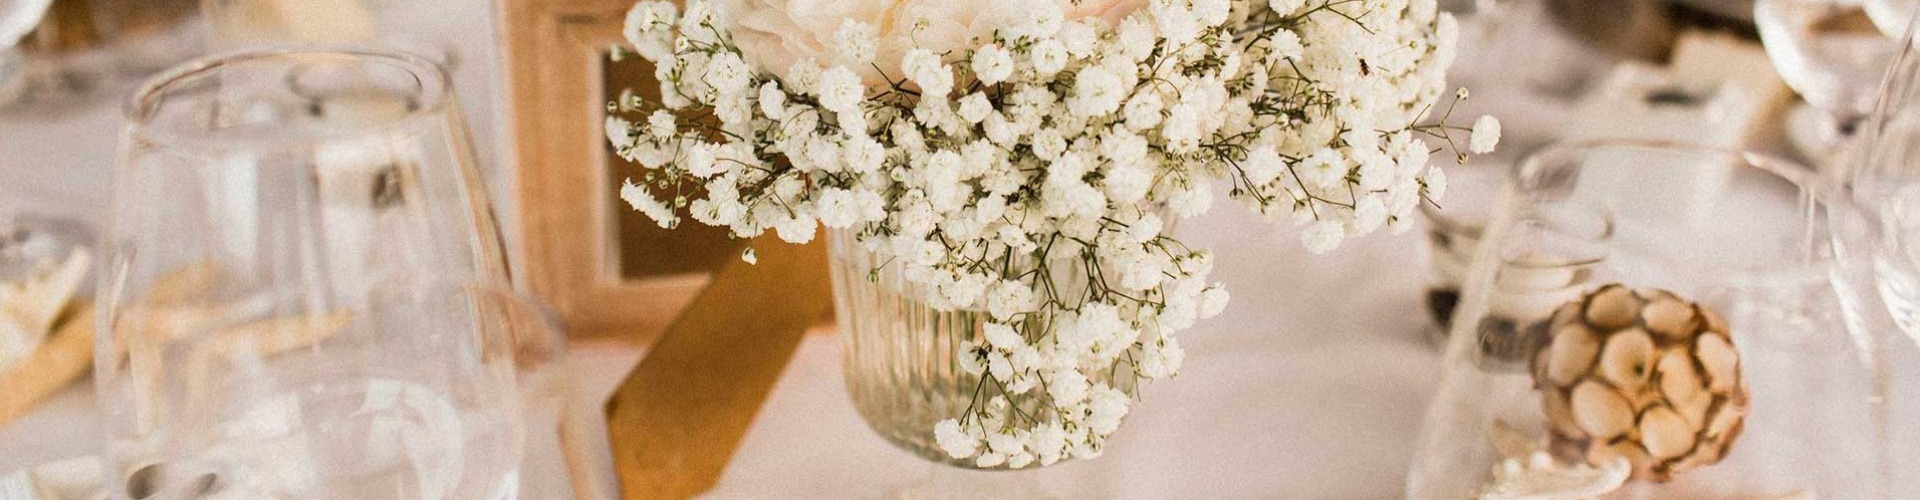 Esküvői etikett 2.